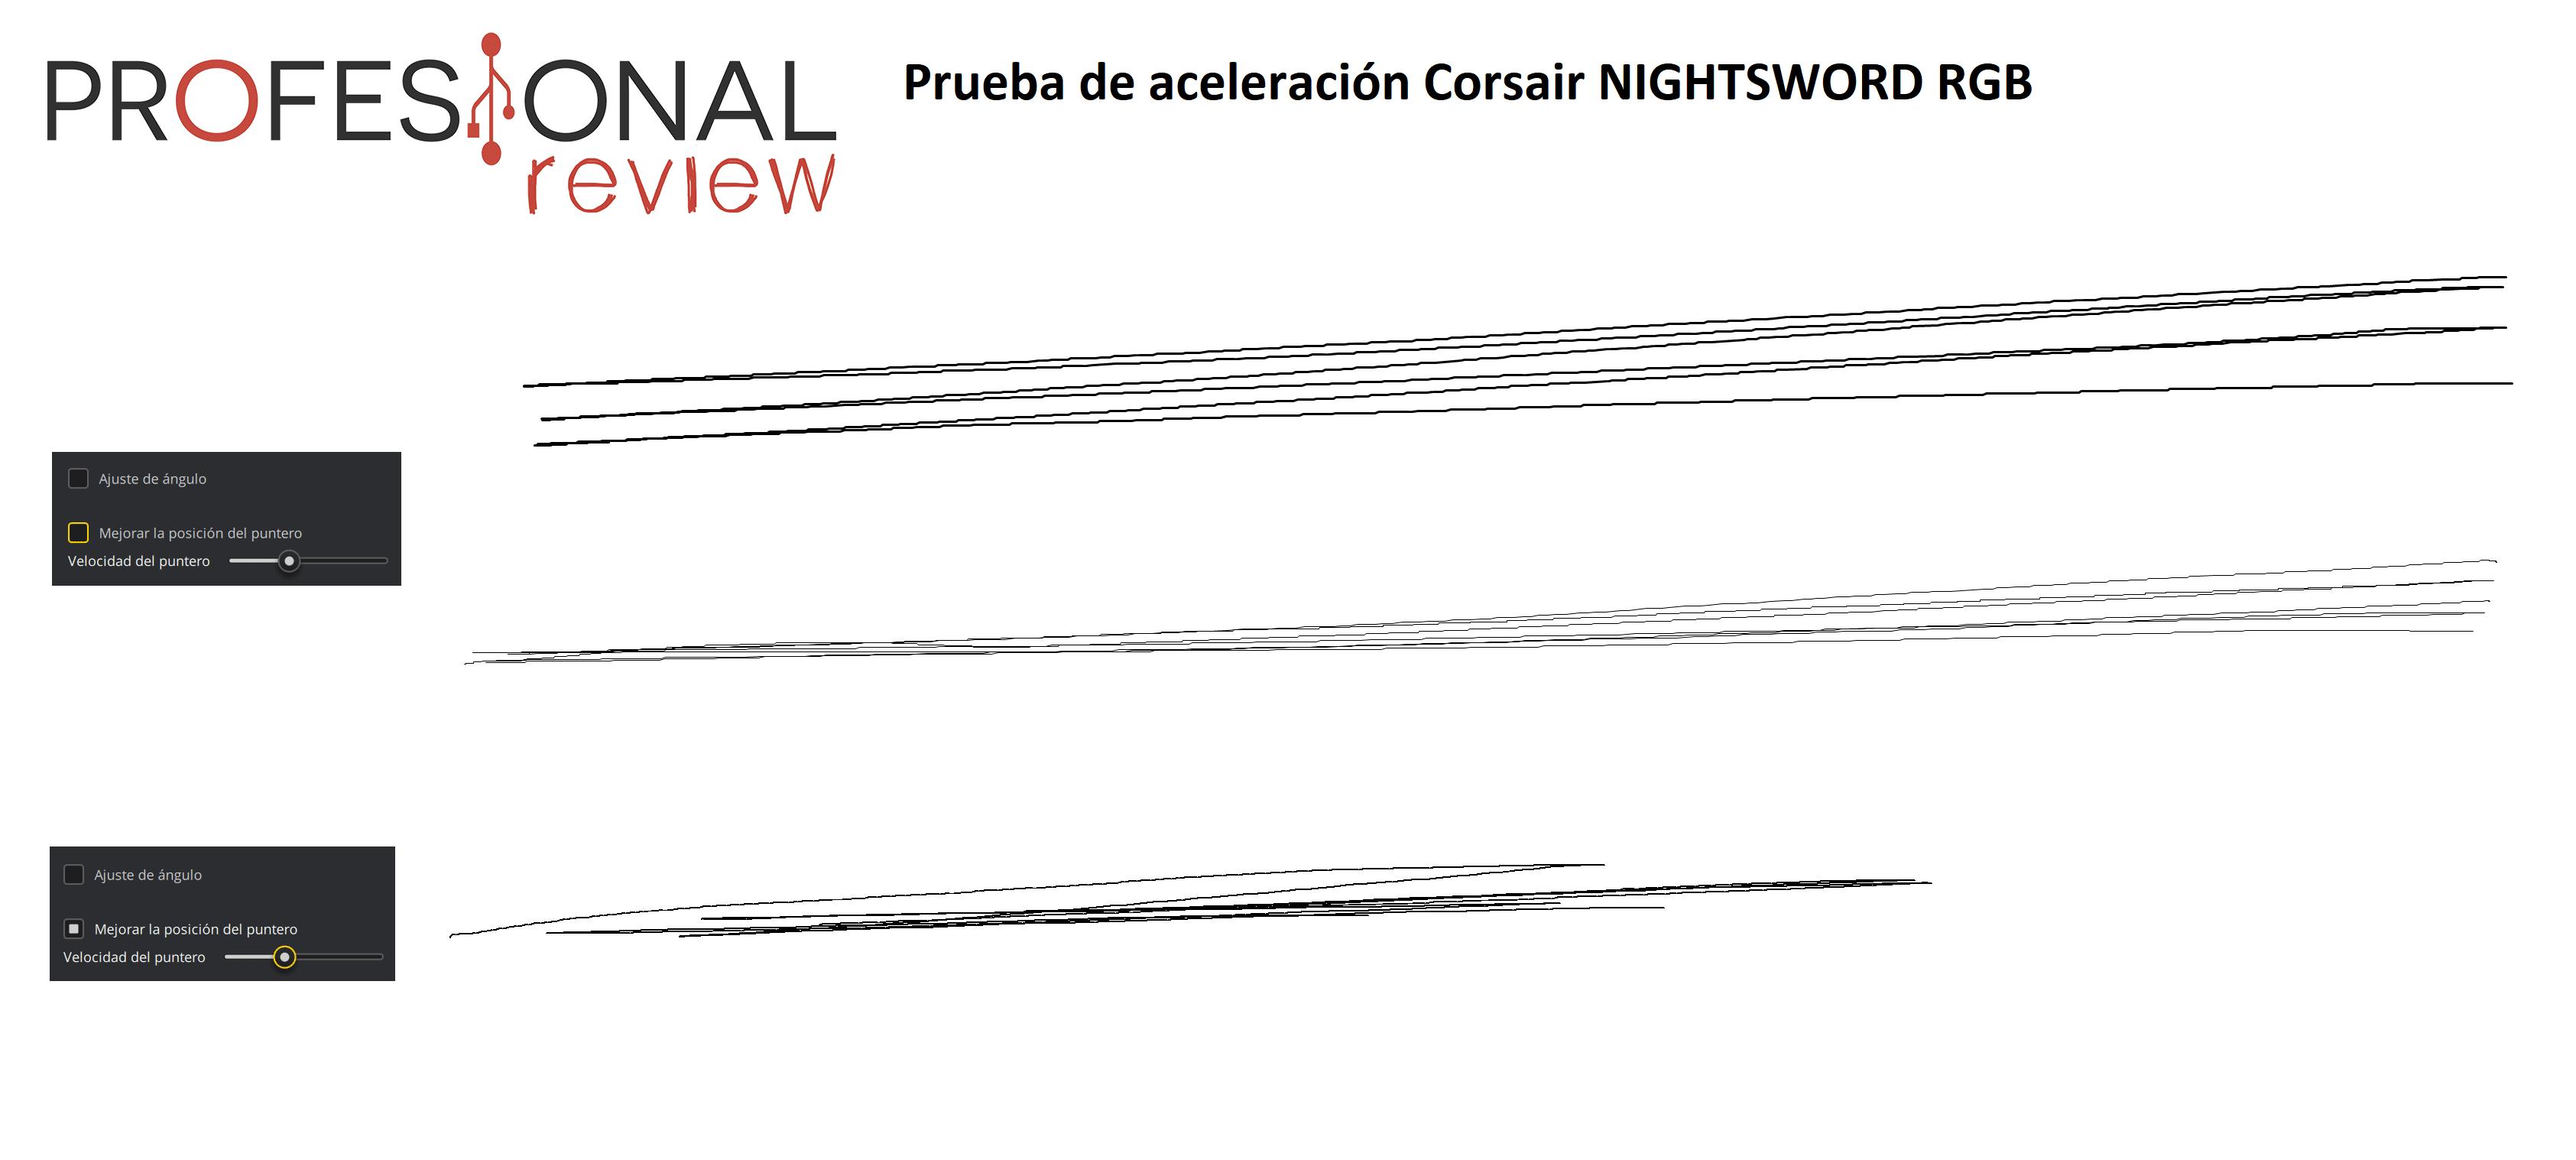 Corsair NIGHTSWORD RGB aceleración